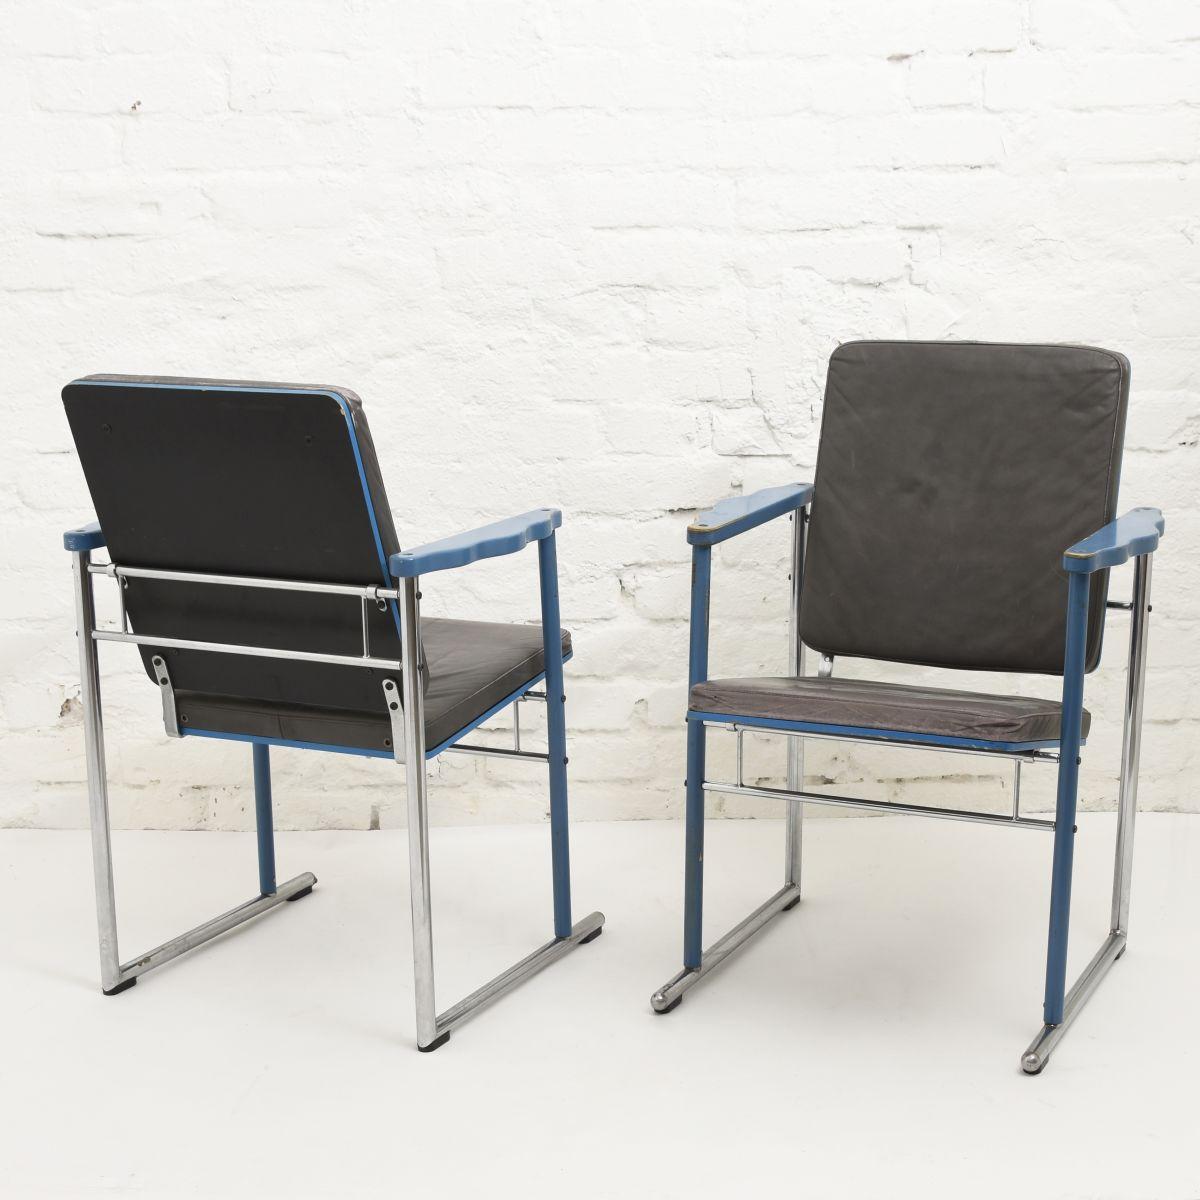 Kukkapuro-Yrjö-Armchair-Blue-Leather